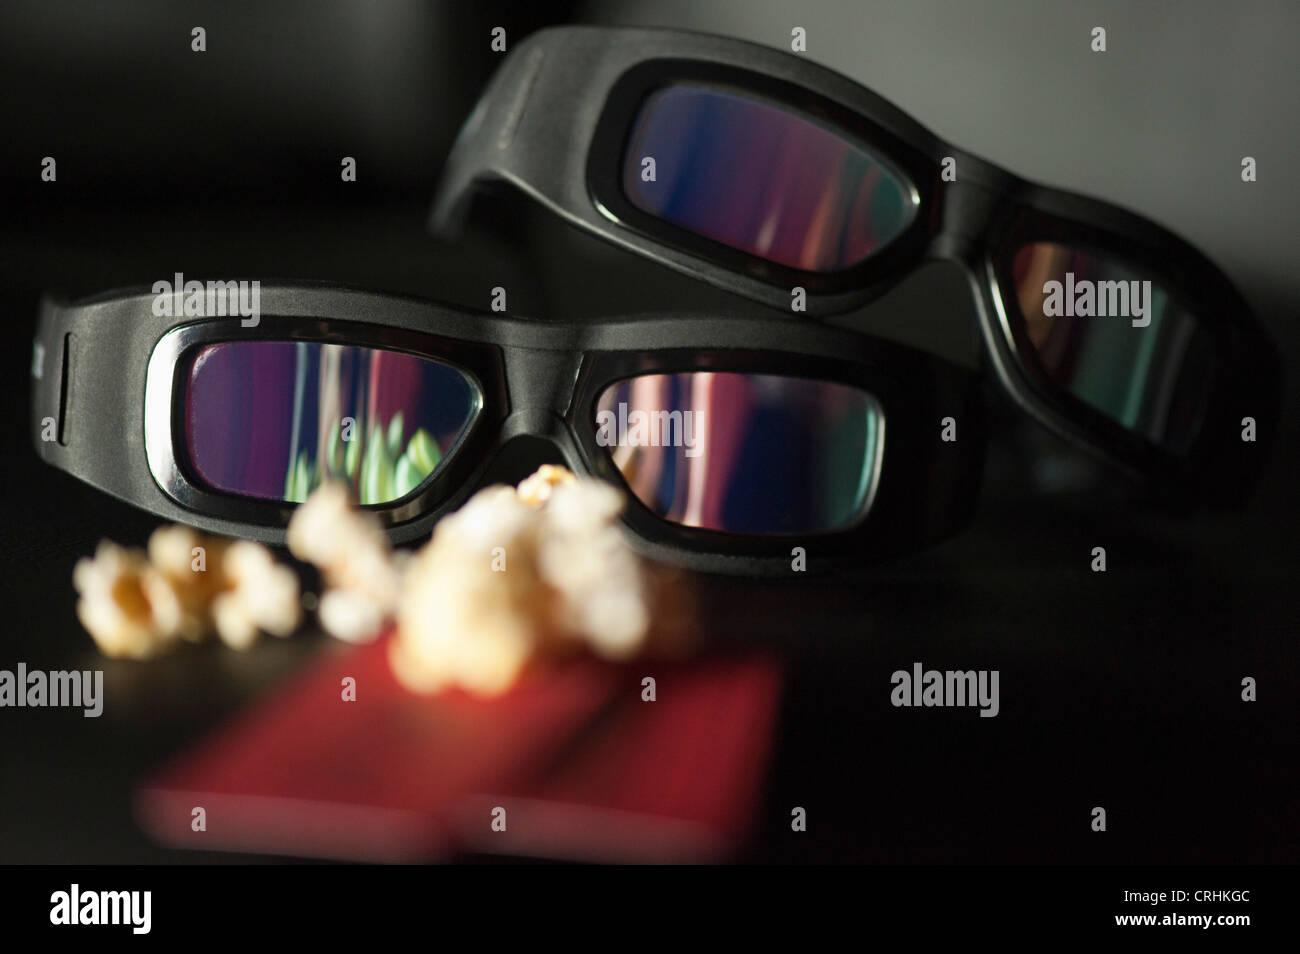 3-D glasses - Stock Image